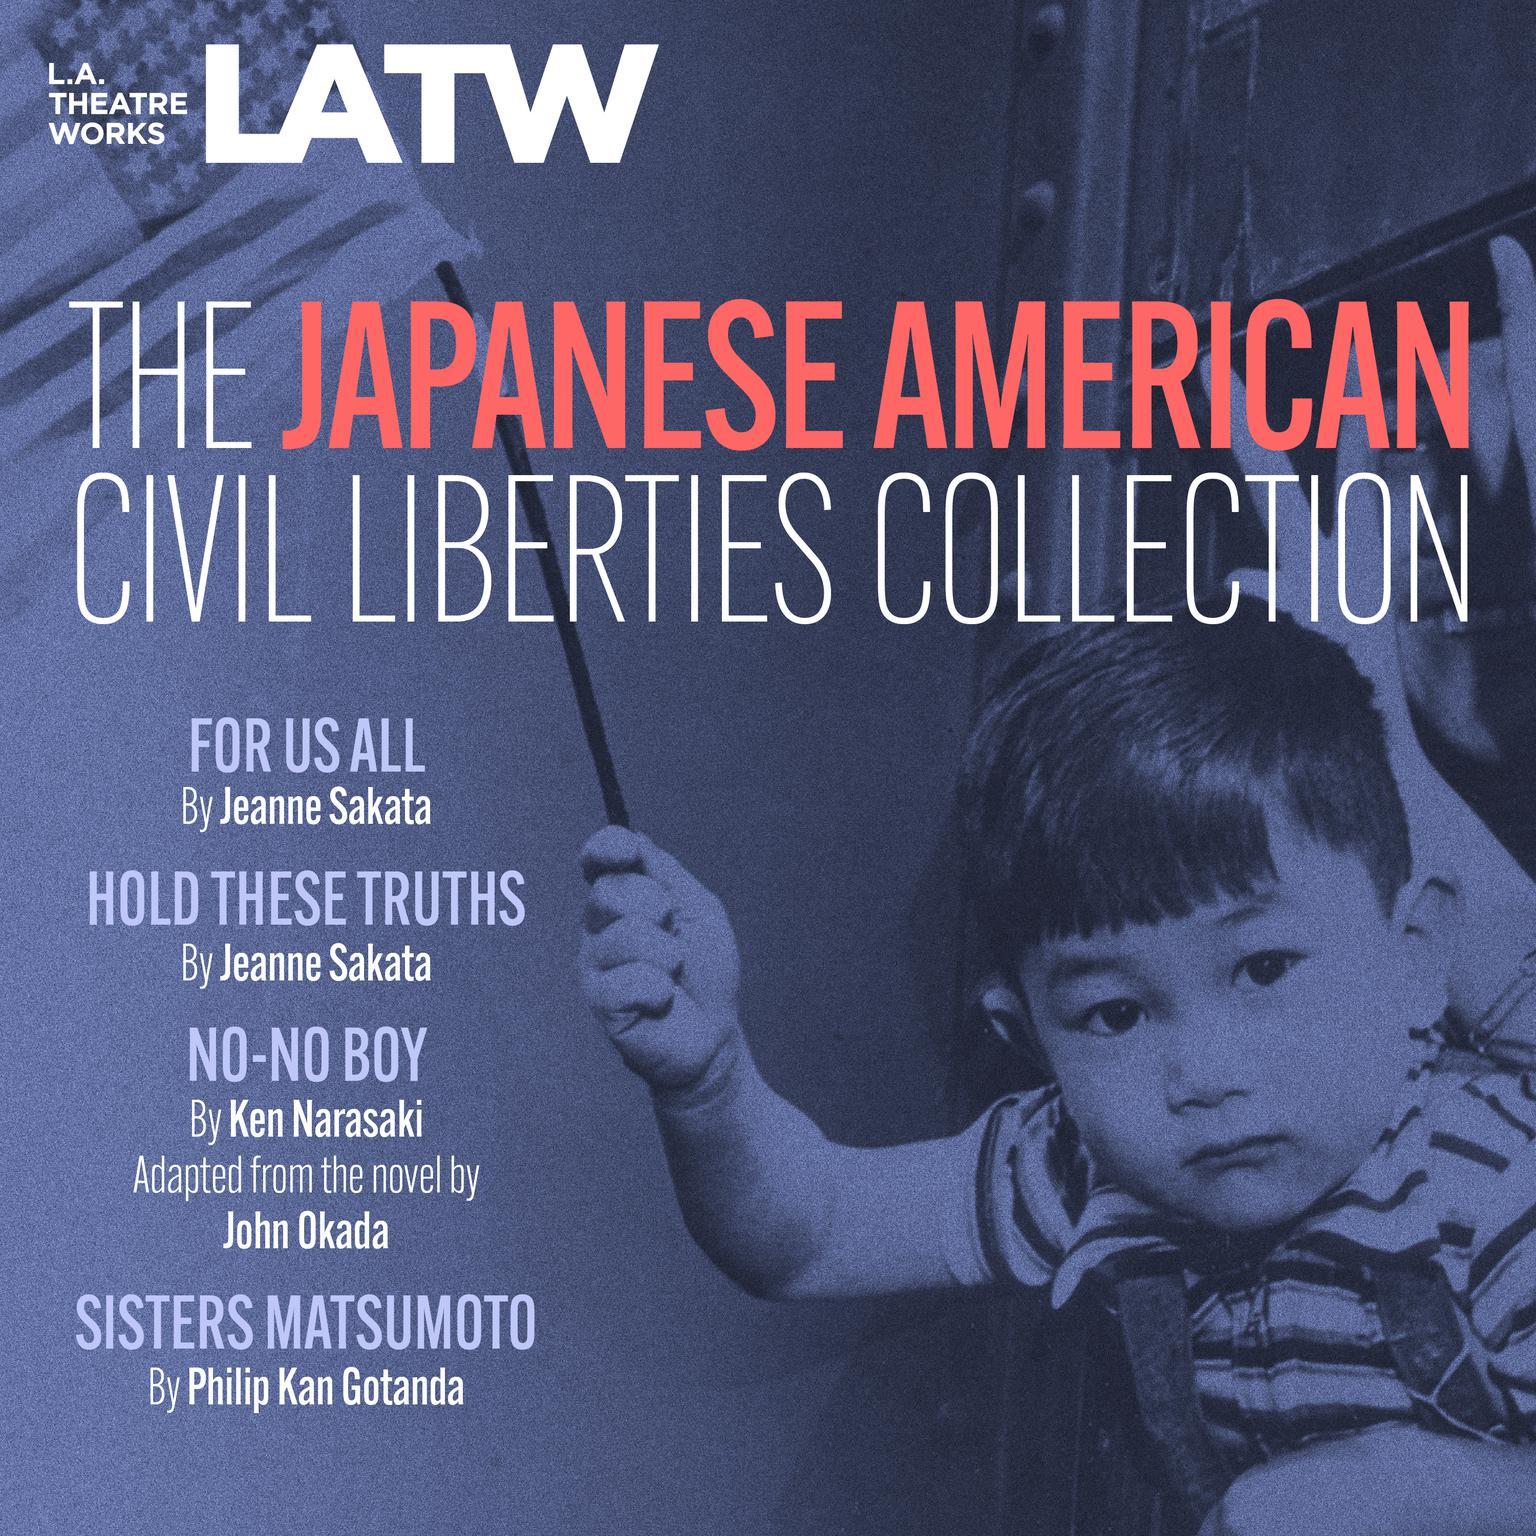 The Japanese American Civil Liberties Collection Audiobook, by Philip Kan Gotanda